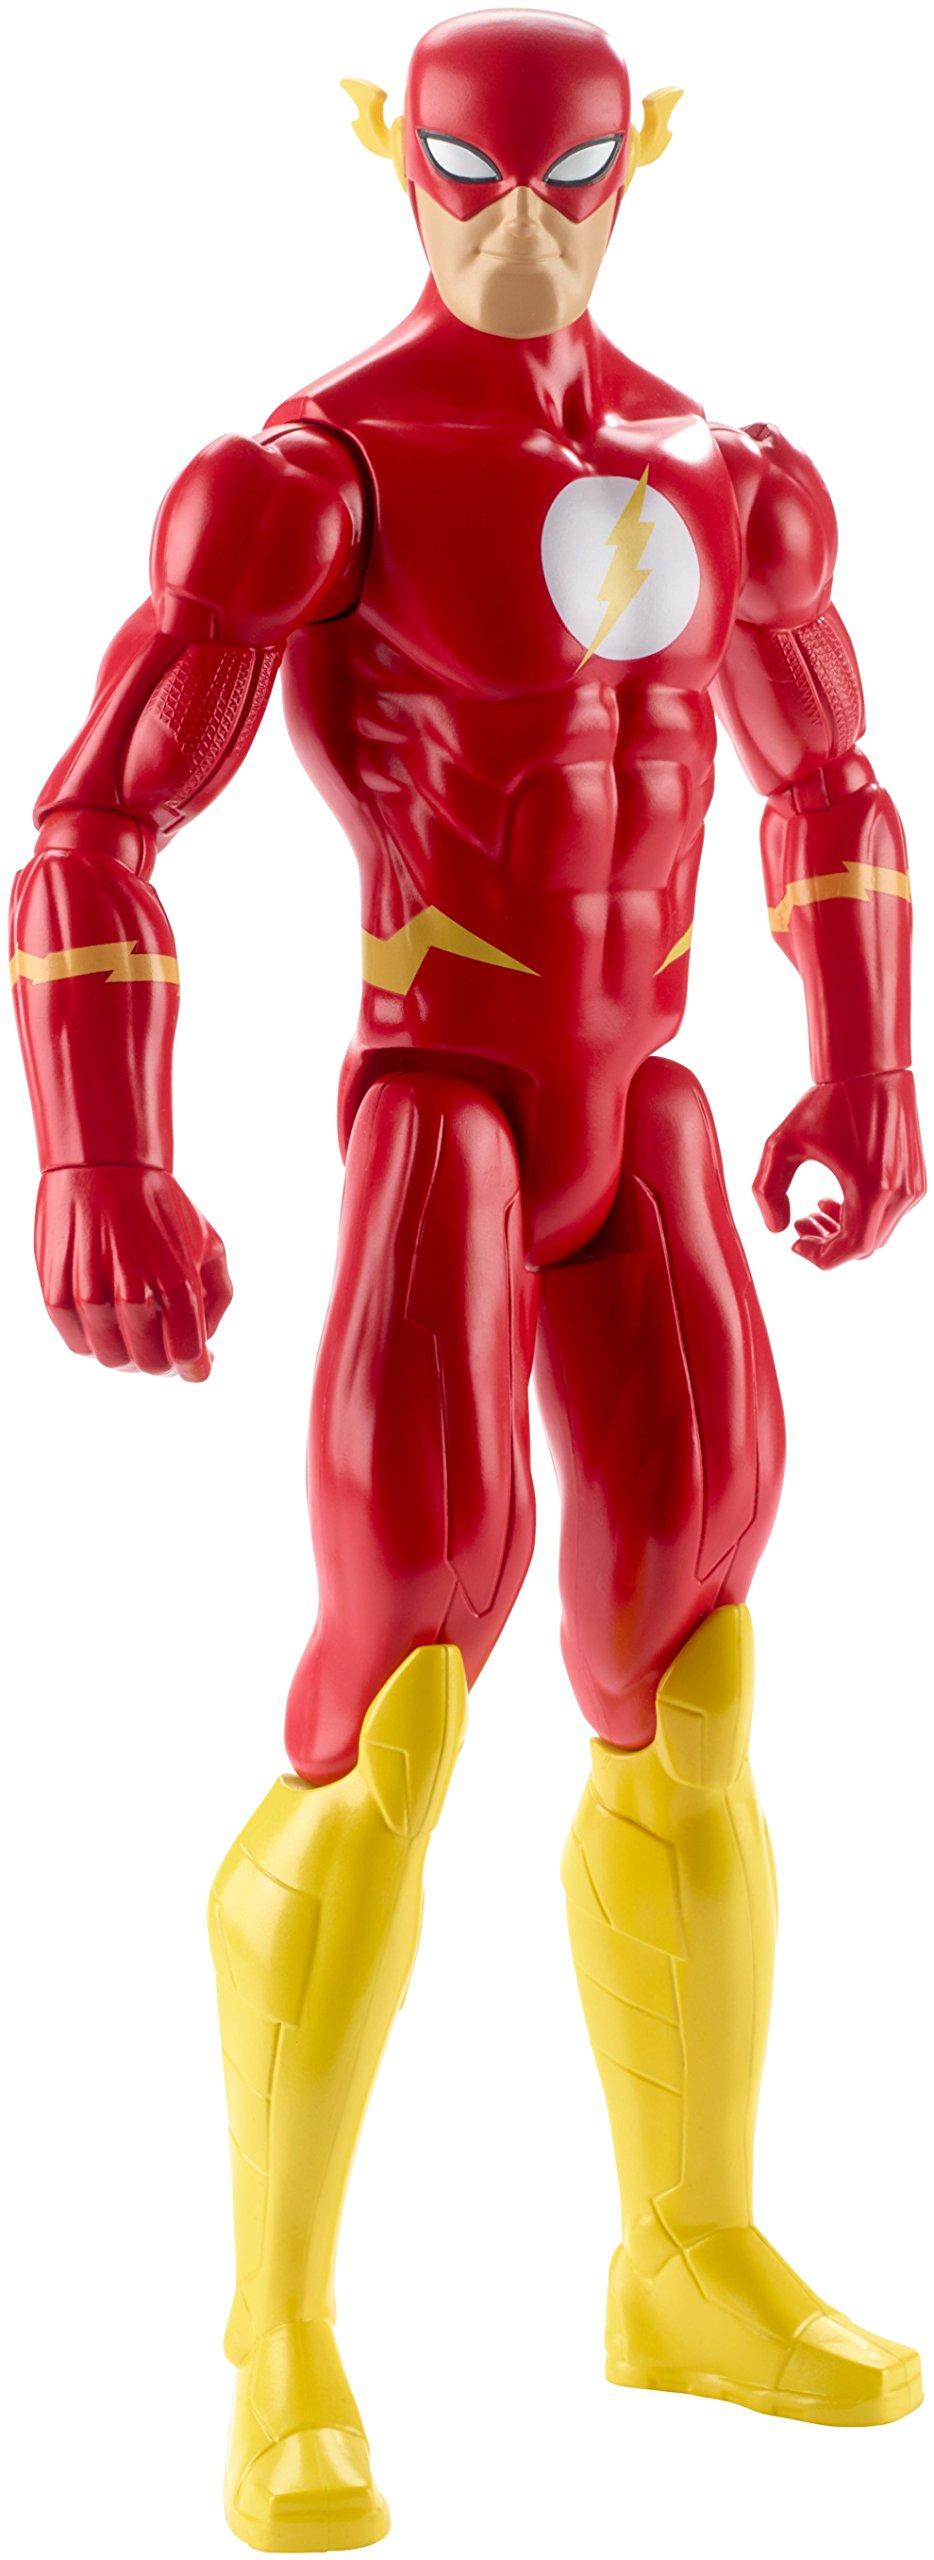 Justice League Action The Flash Figure, 12'' by Mattel (Image #2)